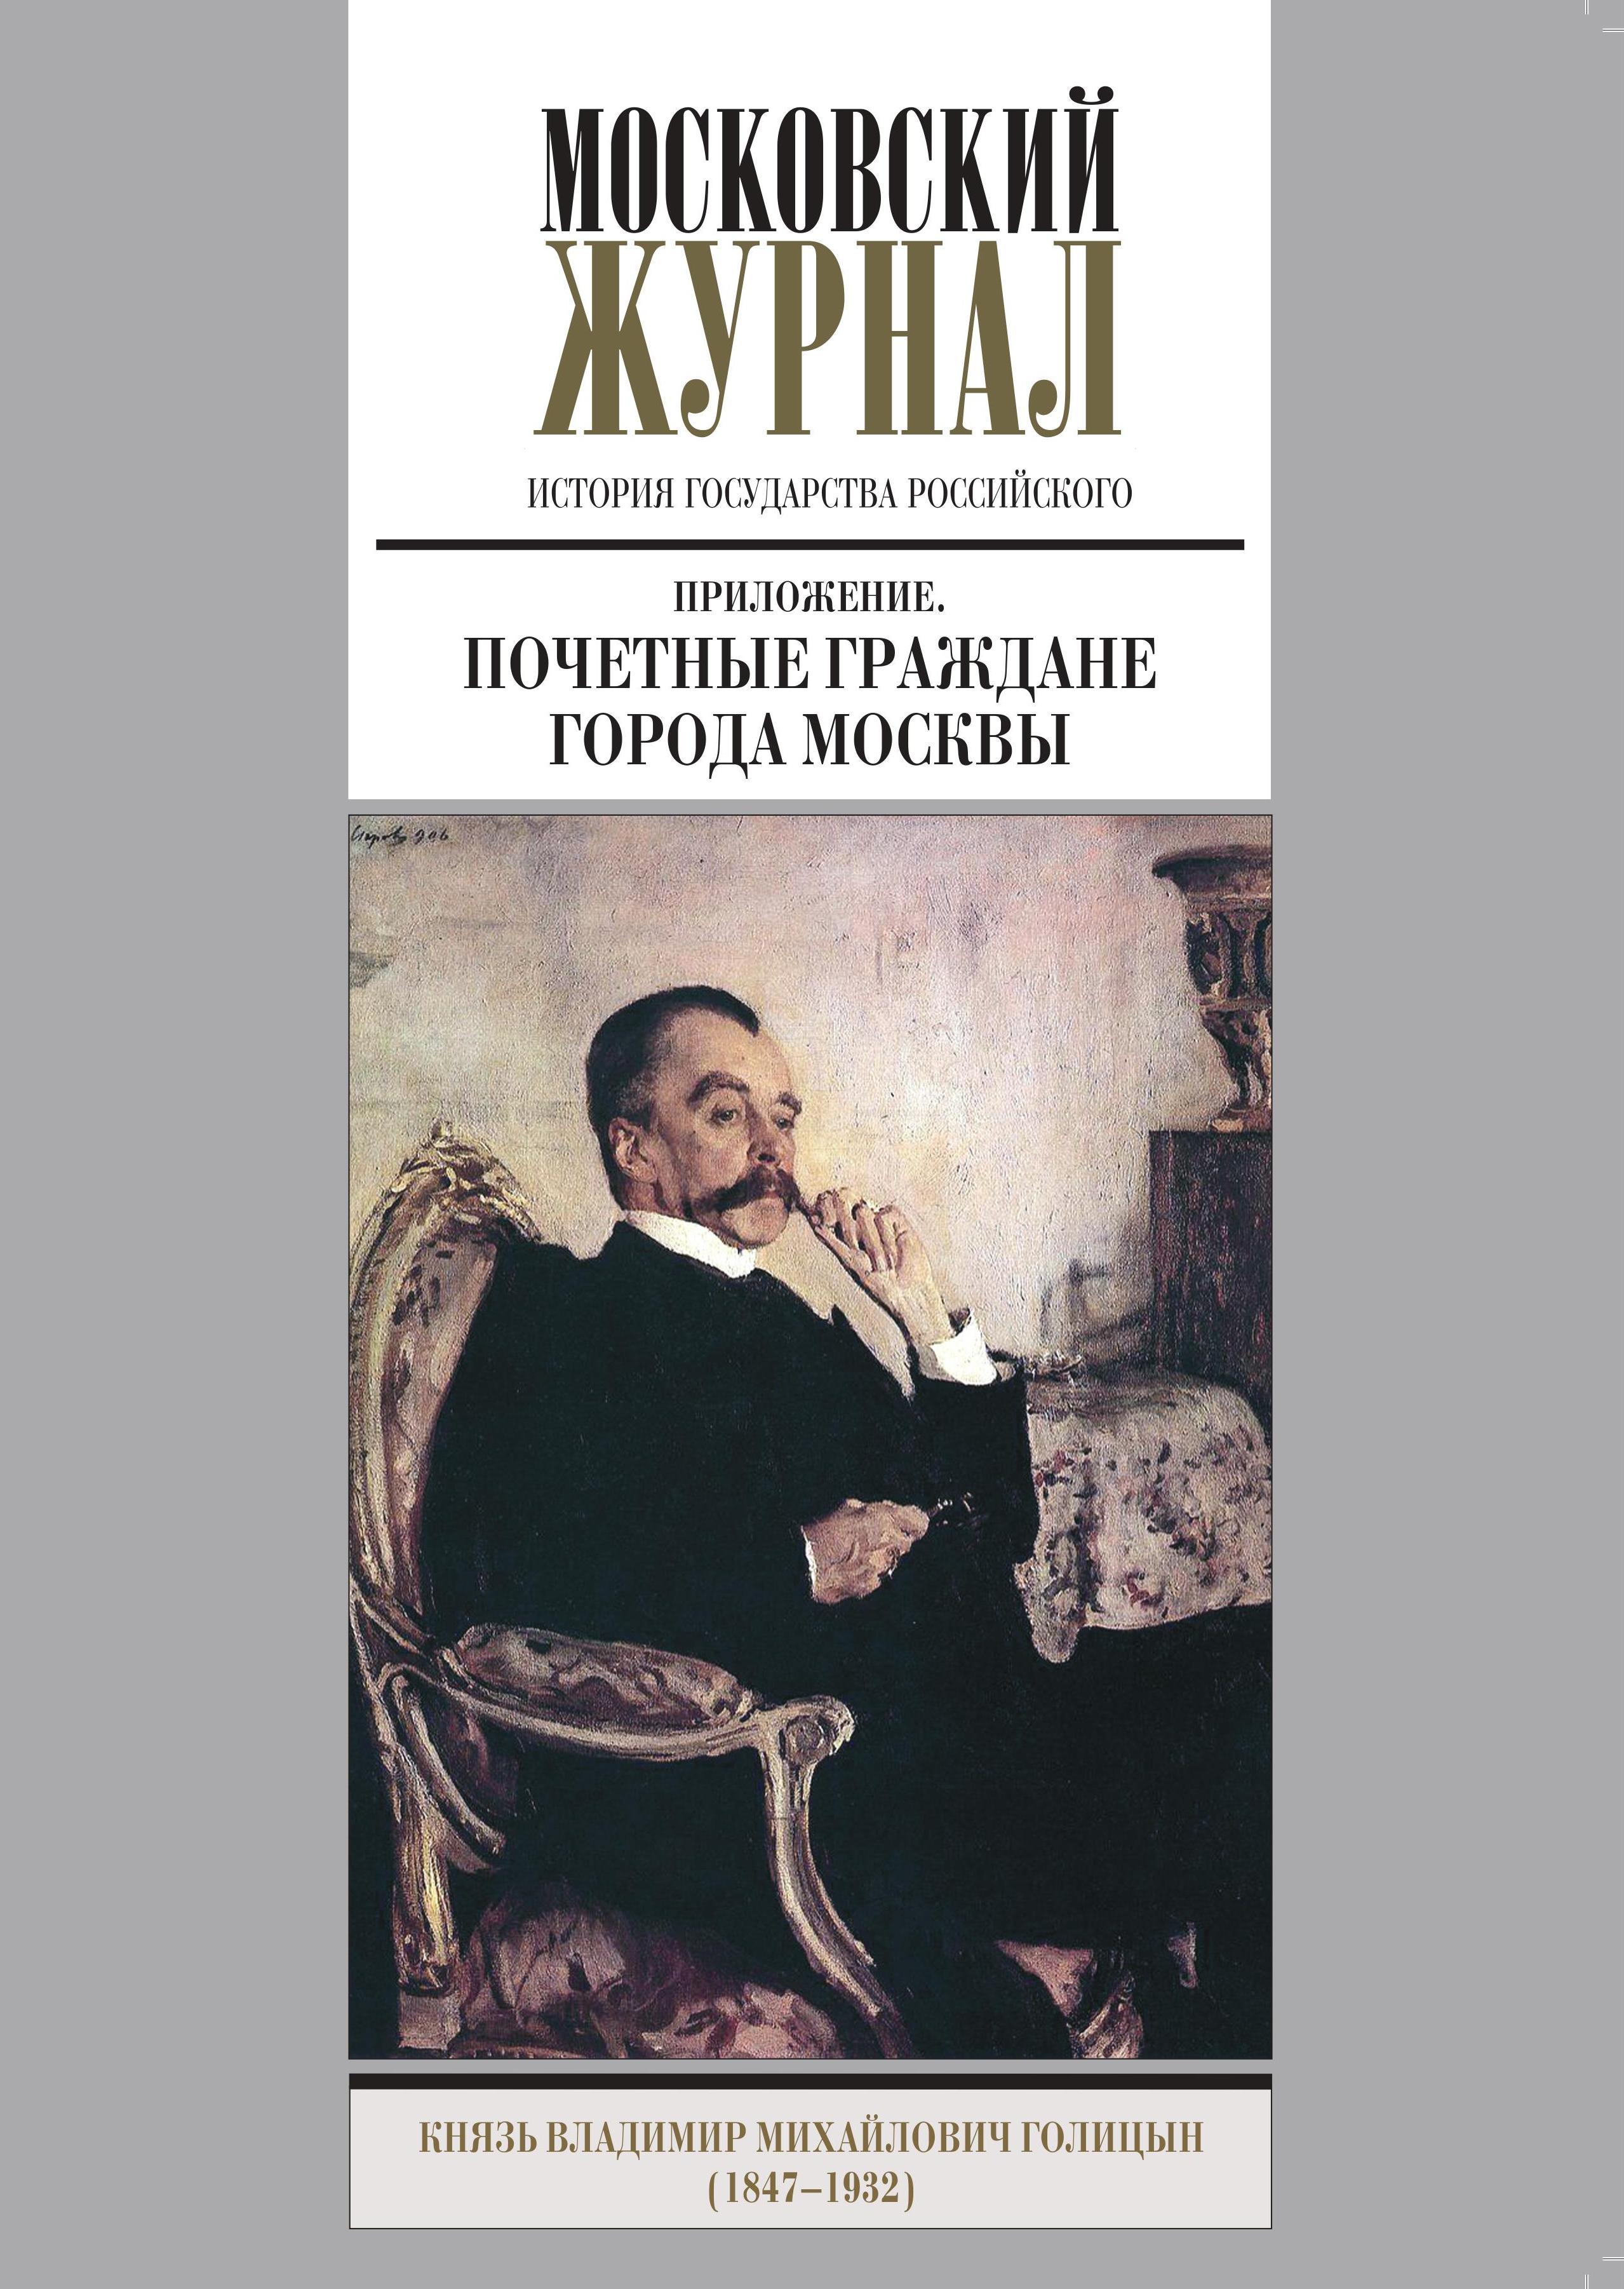 КНЯЗЬ ВЛАДИМИР МИХАЙЛОВИЧ ГОЛИЦЫН (1847–1932)